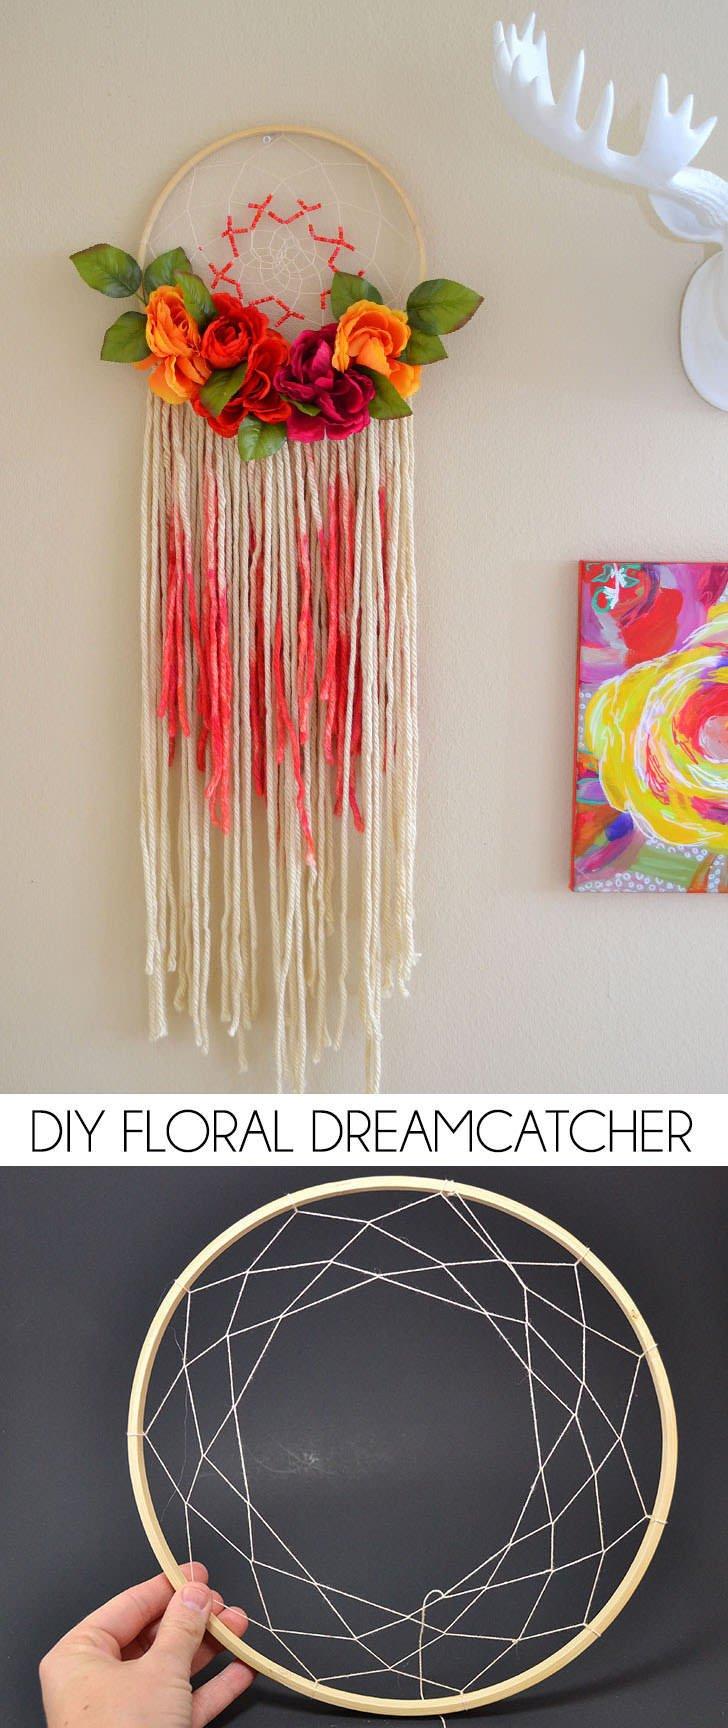 Bohemian Floral Dreamcatcher - Dream a Little Bigger May Flowers Tumblr